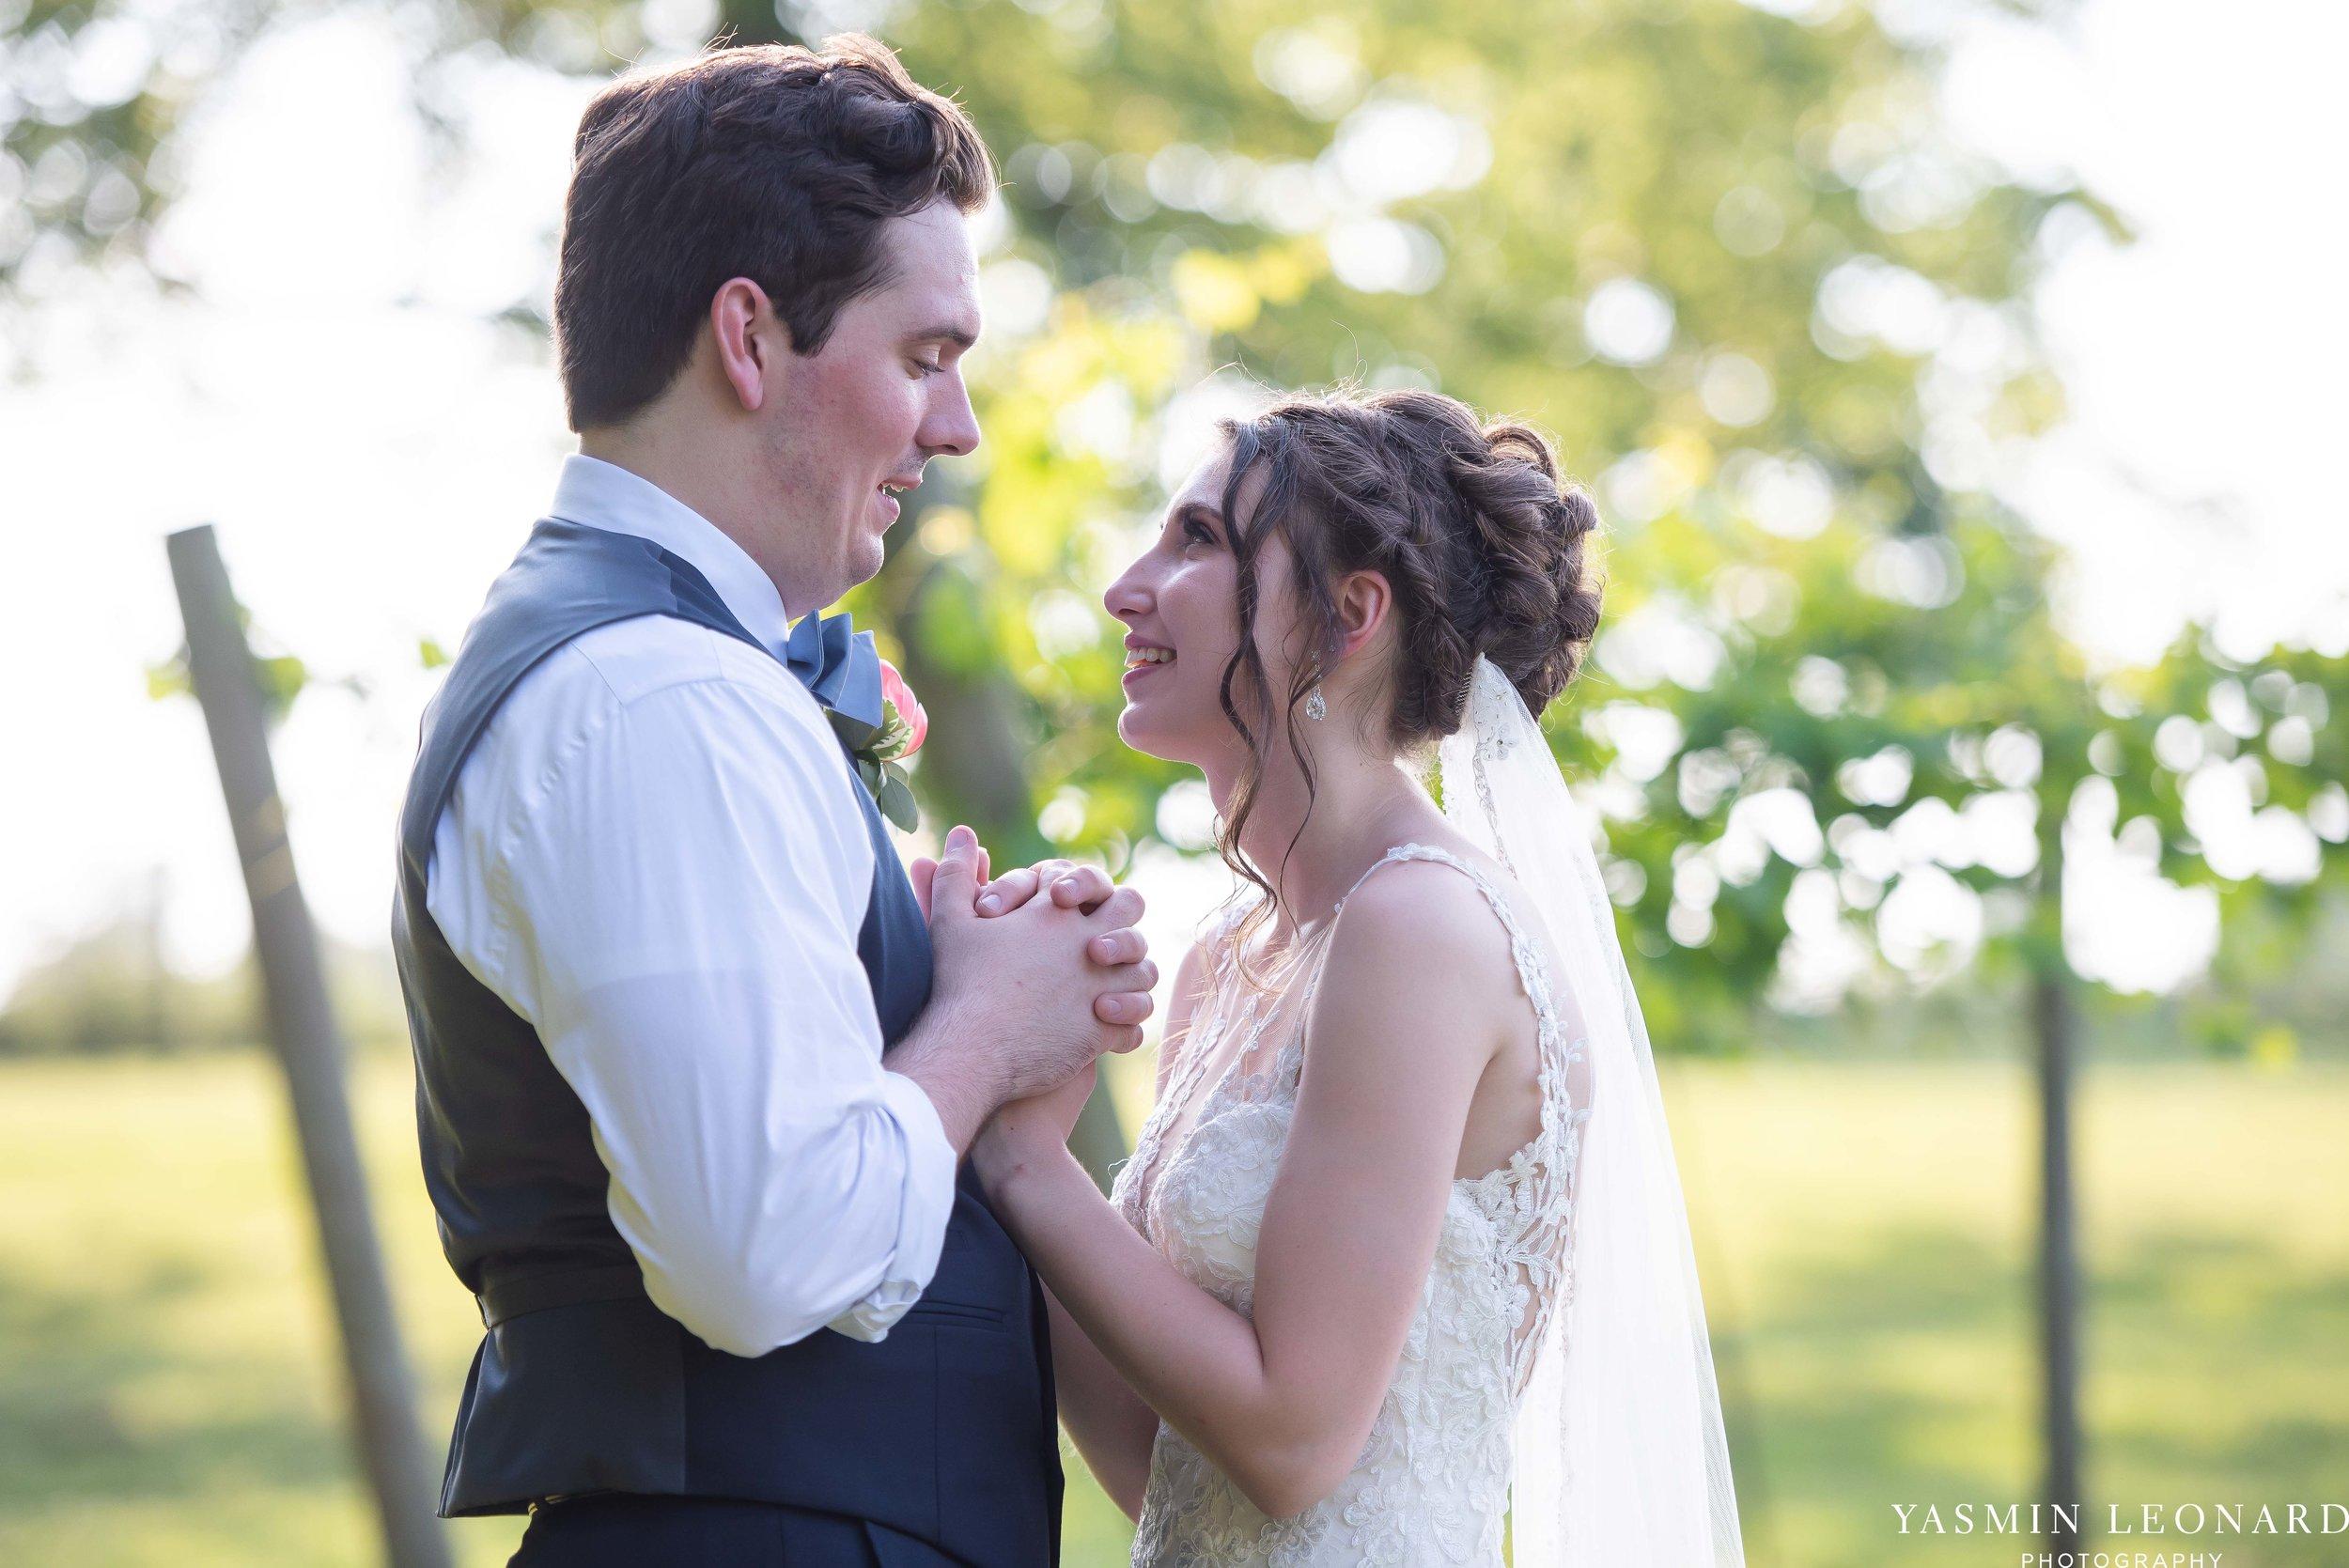 Old Homeplace Vineyard - NC Weddings - Outdoor Summer Weddings - Peony Boutique - Vineyard Wedding - NC Photographer - Yasmin Leonard Photography-46.jpg